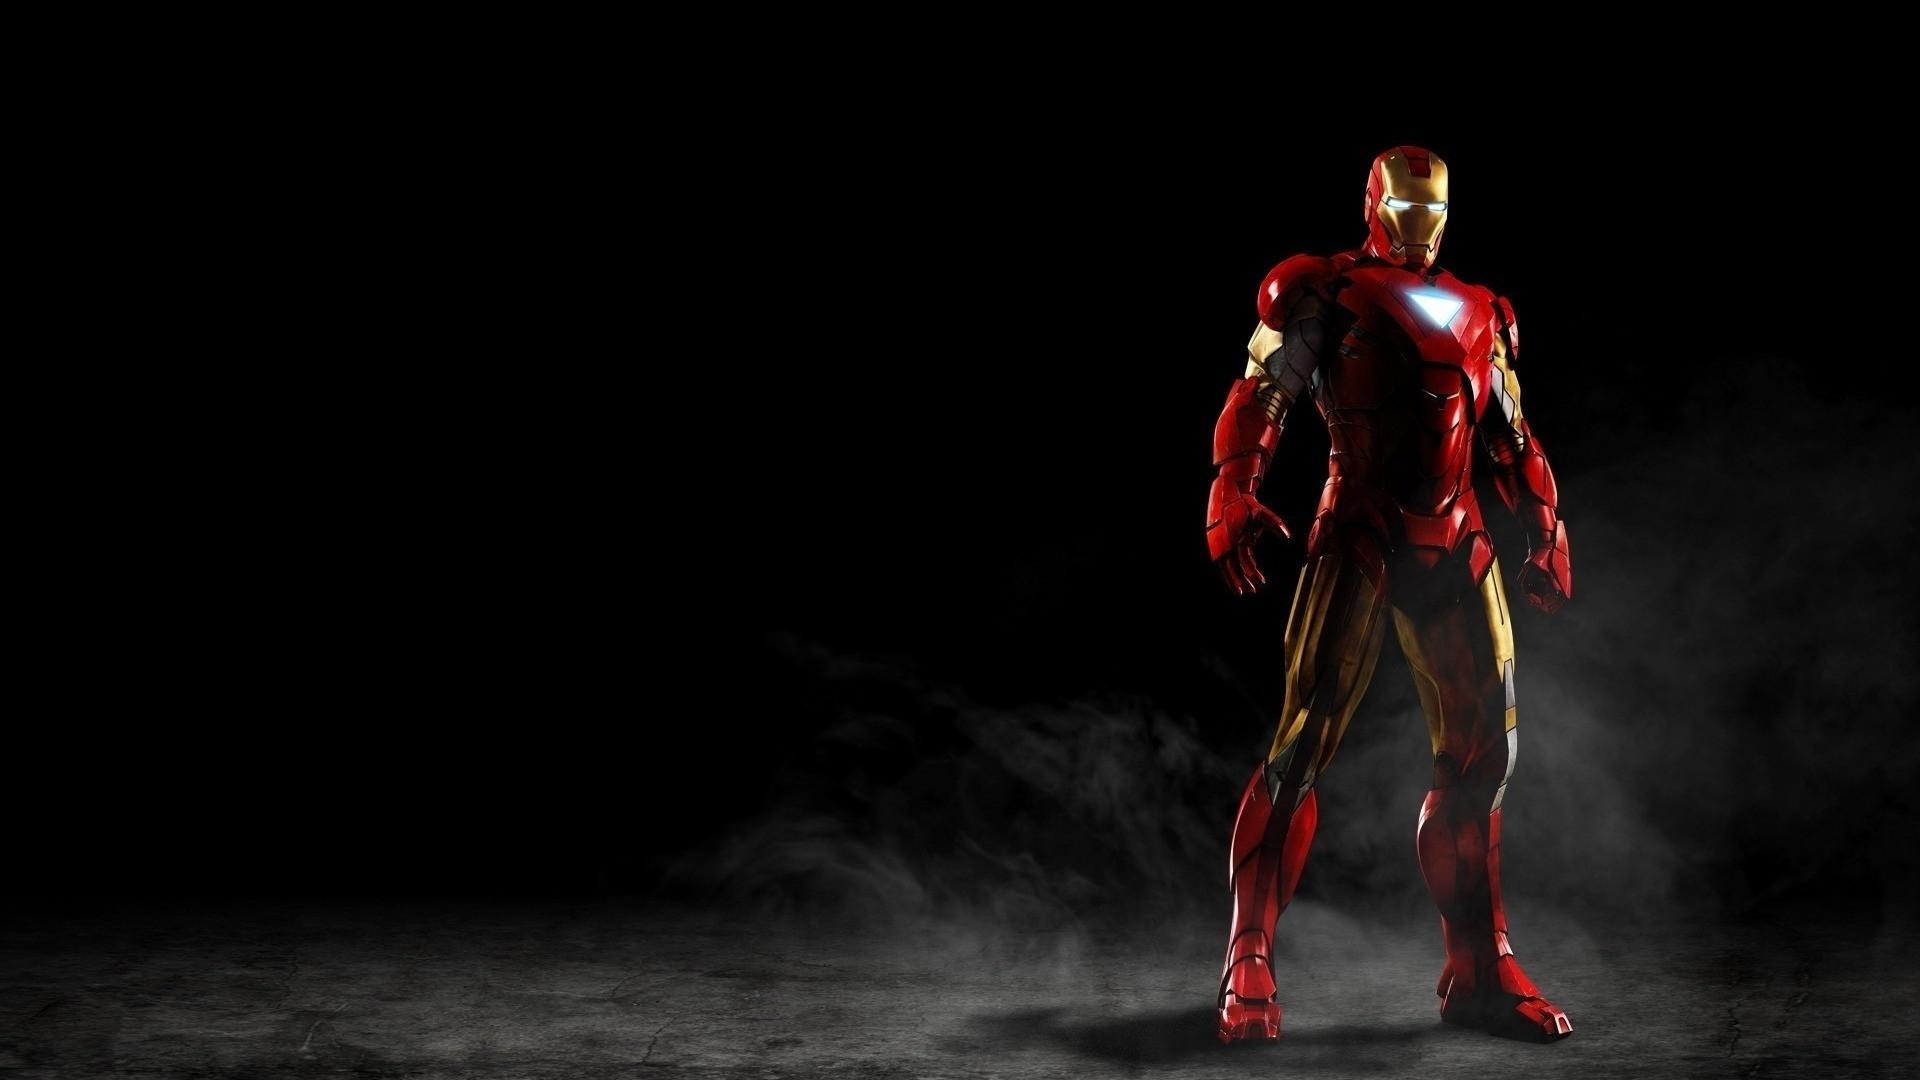 Wallpapers Jarvis Iron Man Ii Movie Hd 1920×1080